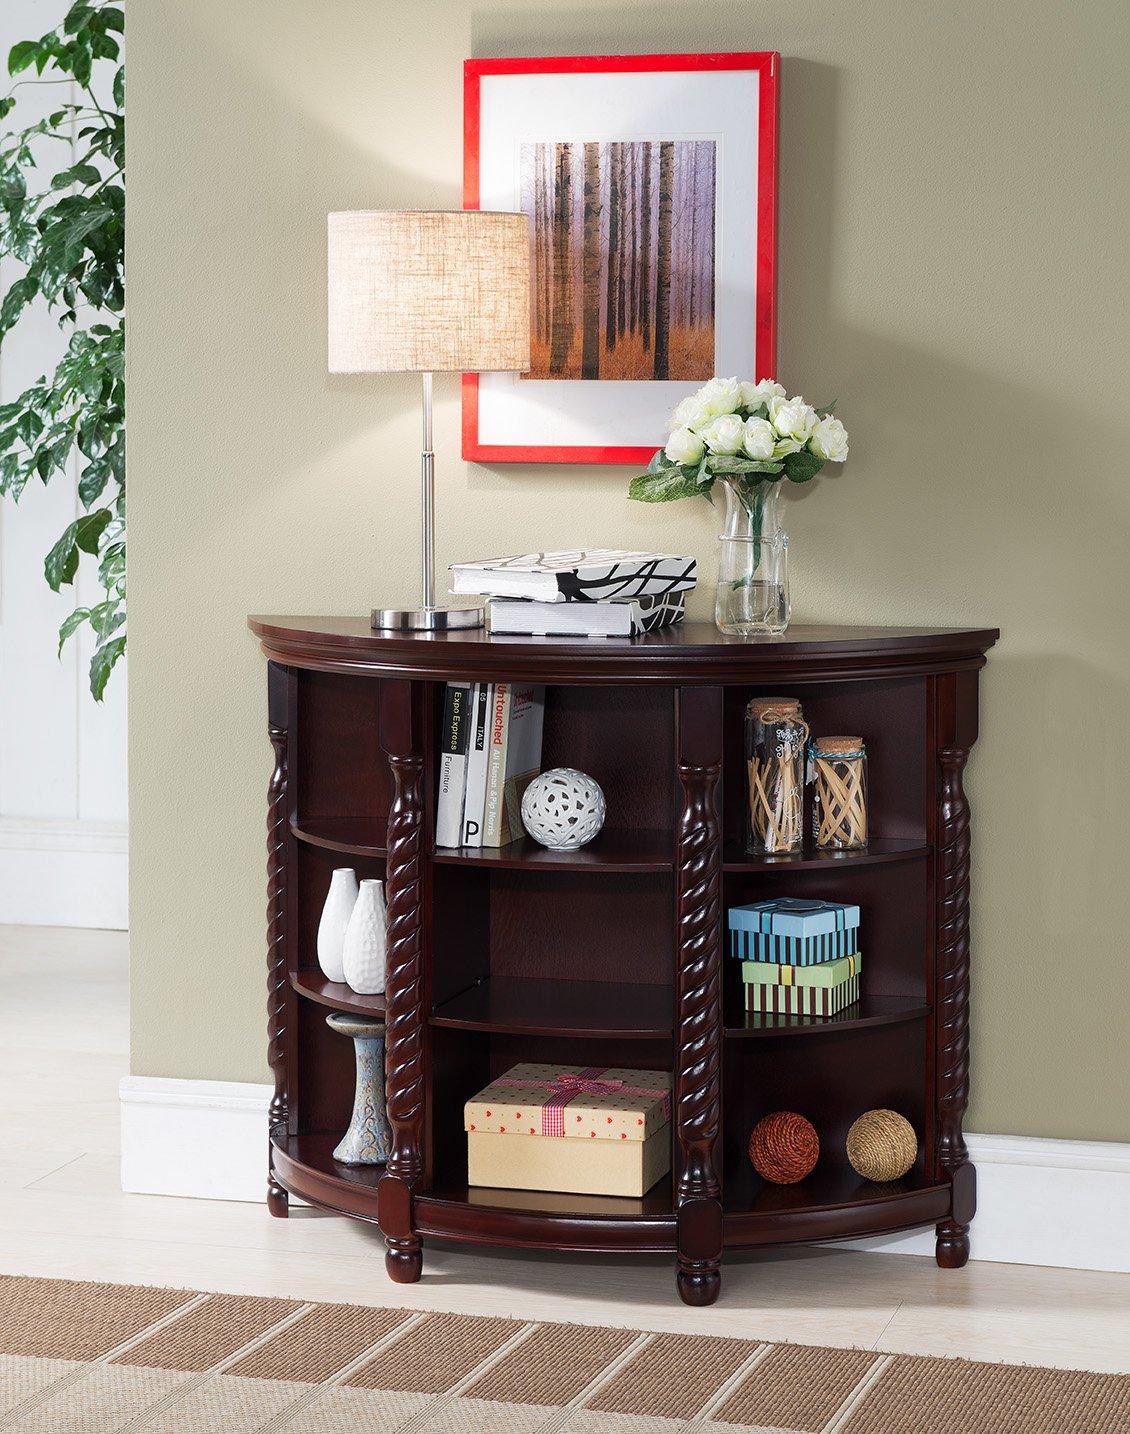 Kings Brand Furniture Wood Entryway Buffet Console Sofa Table, Cherry by Kings Brand Furniture